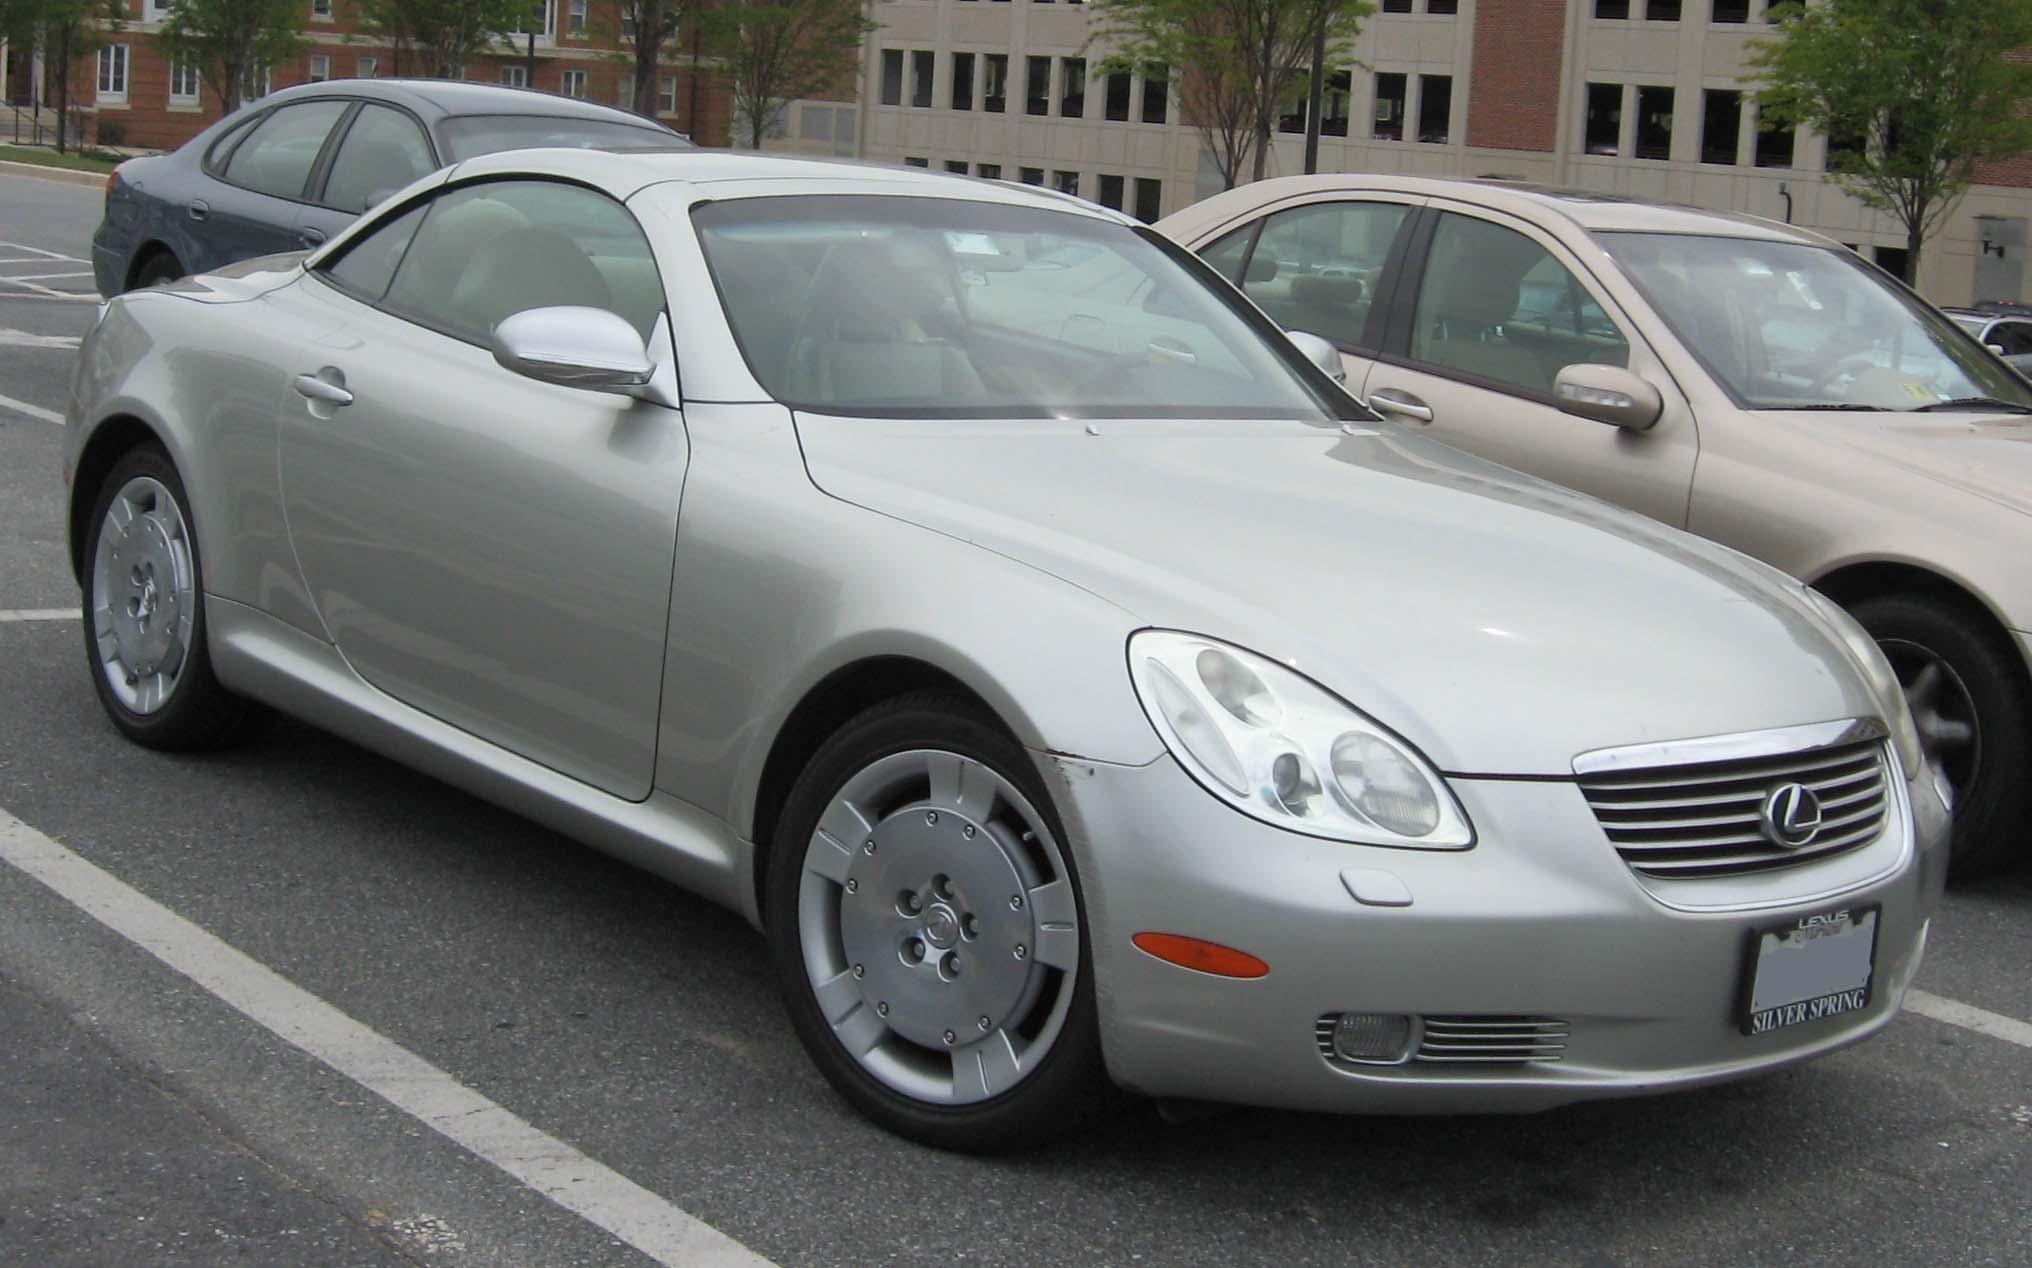 http://upload.wikimedia.org/wikipedia/commons/8/88/Lexus-SC430-2.jpg